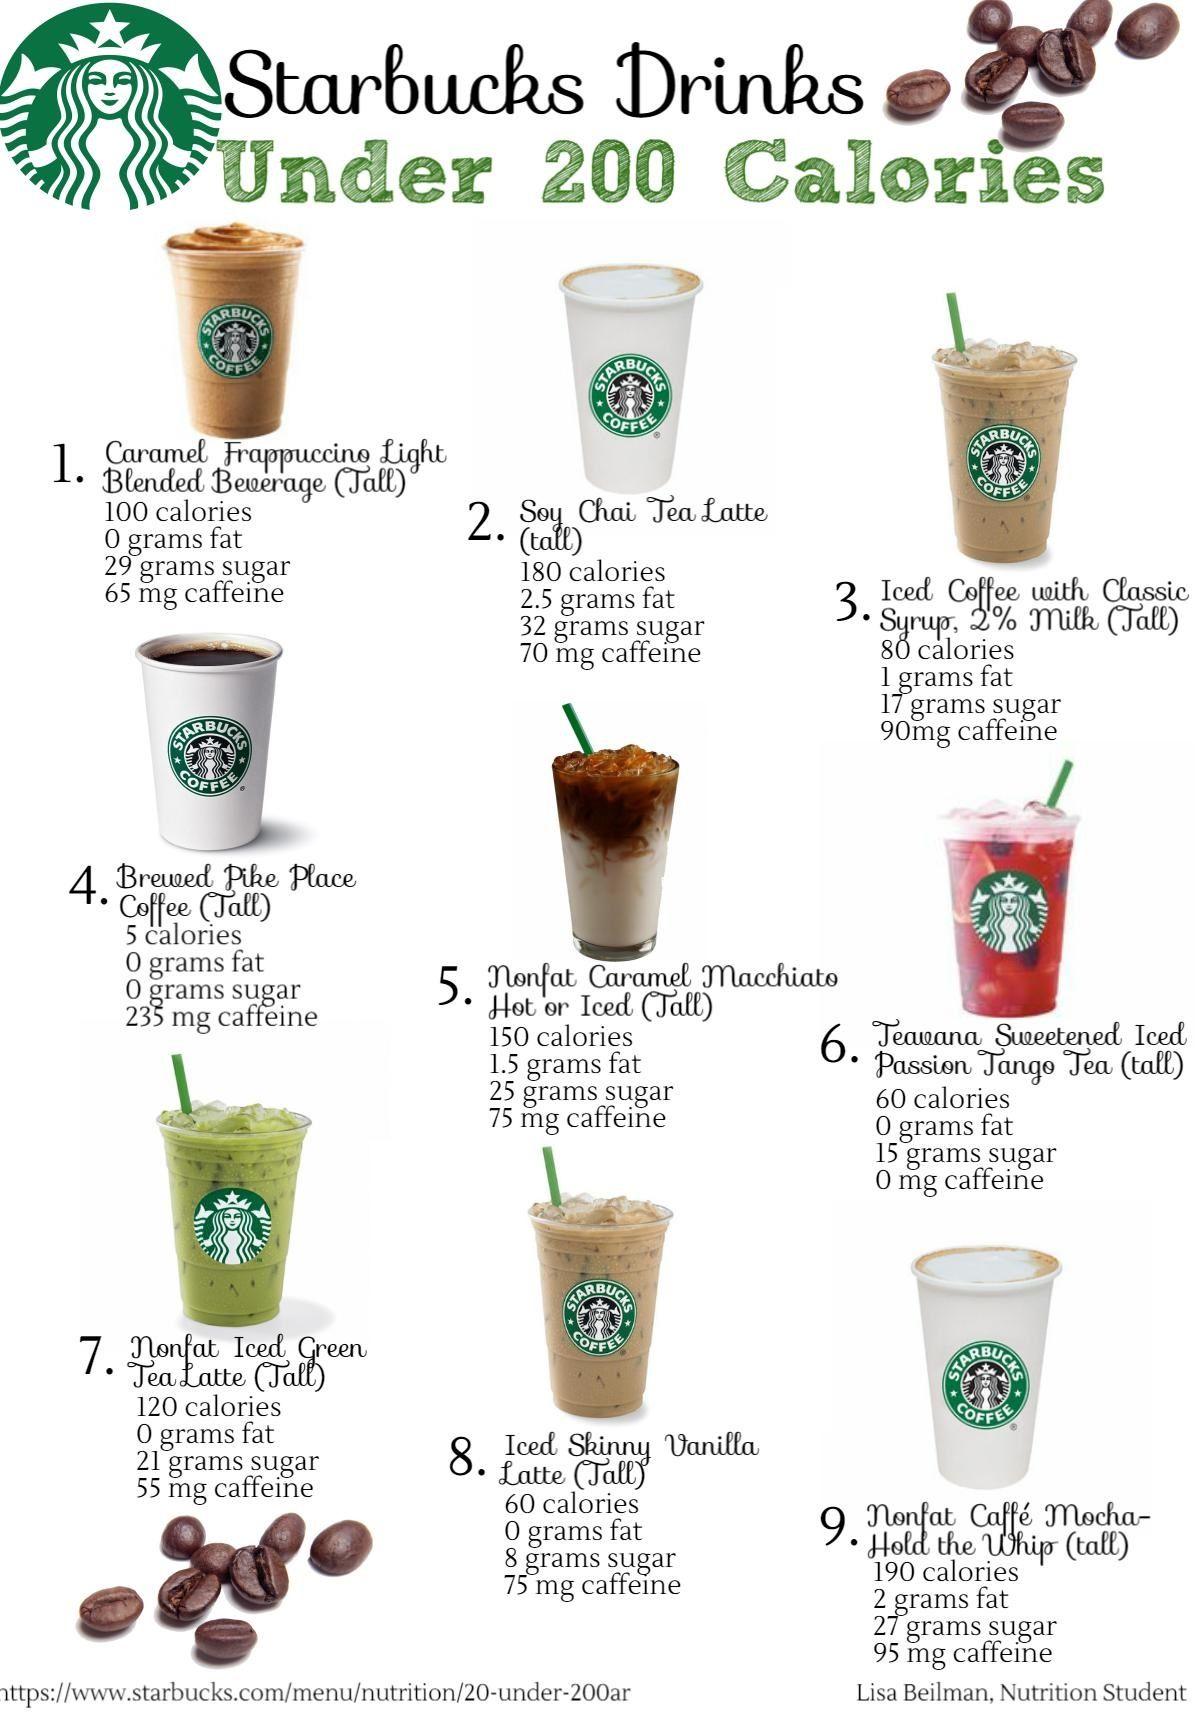 Starbucks Calorie Calculator : starbucks, calorie, calculator, Heathy, Eating, Ideas, Healthy, Starbucks, Drinks,, Starbucks,, Calorie, Snacks